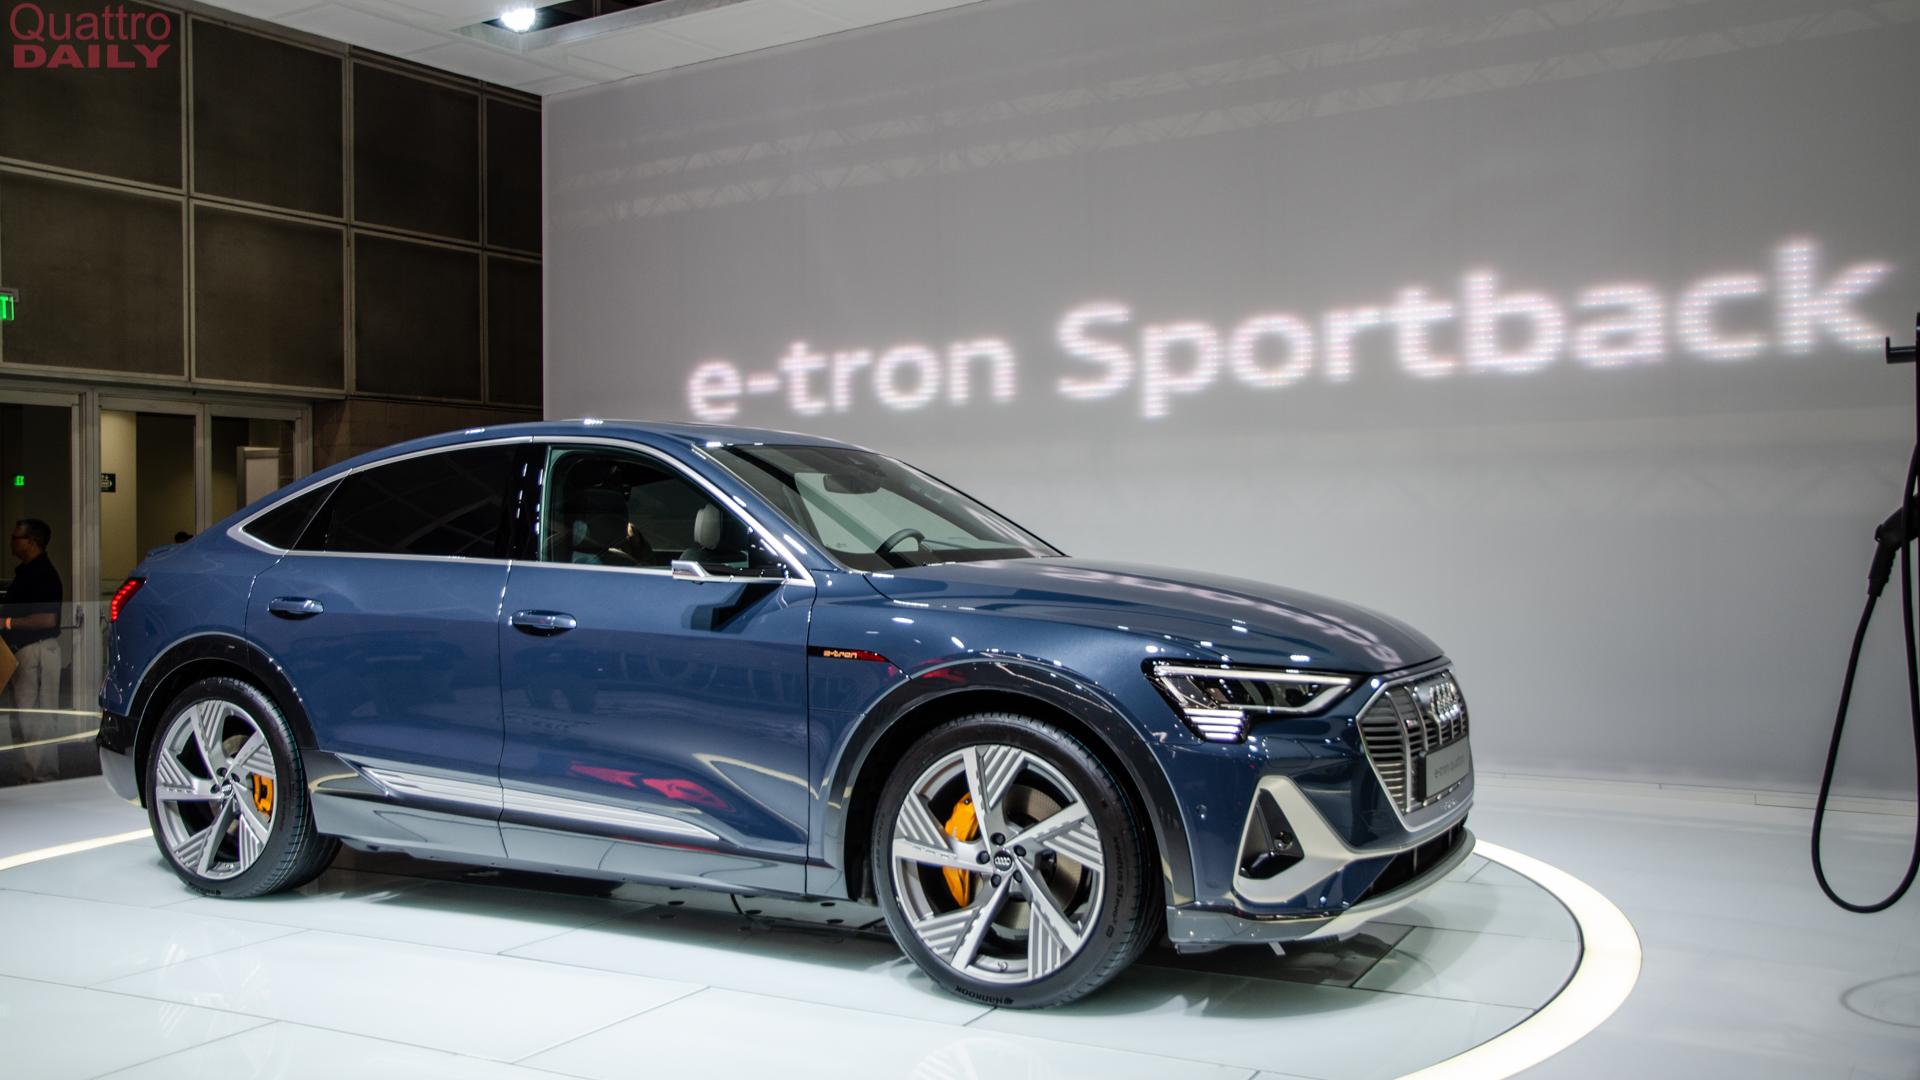 Audi e tron Sportback LA Auto Show 10 of 12